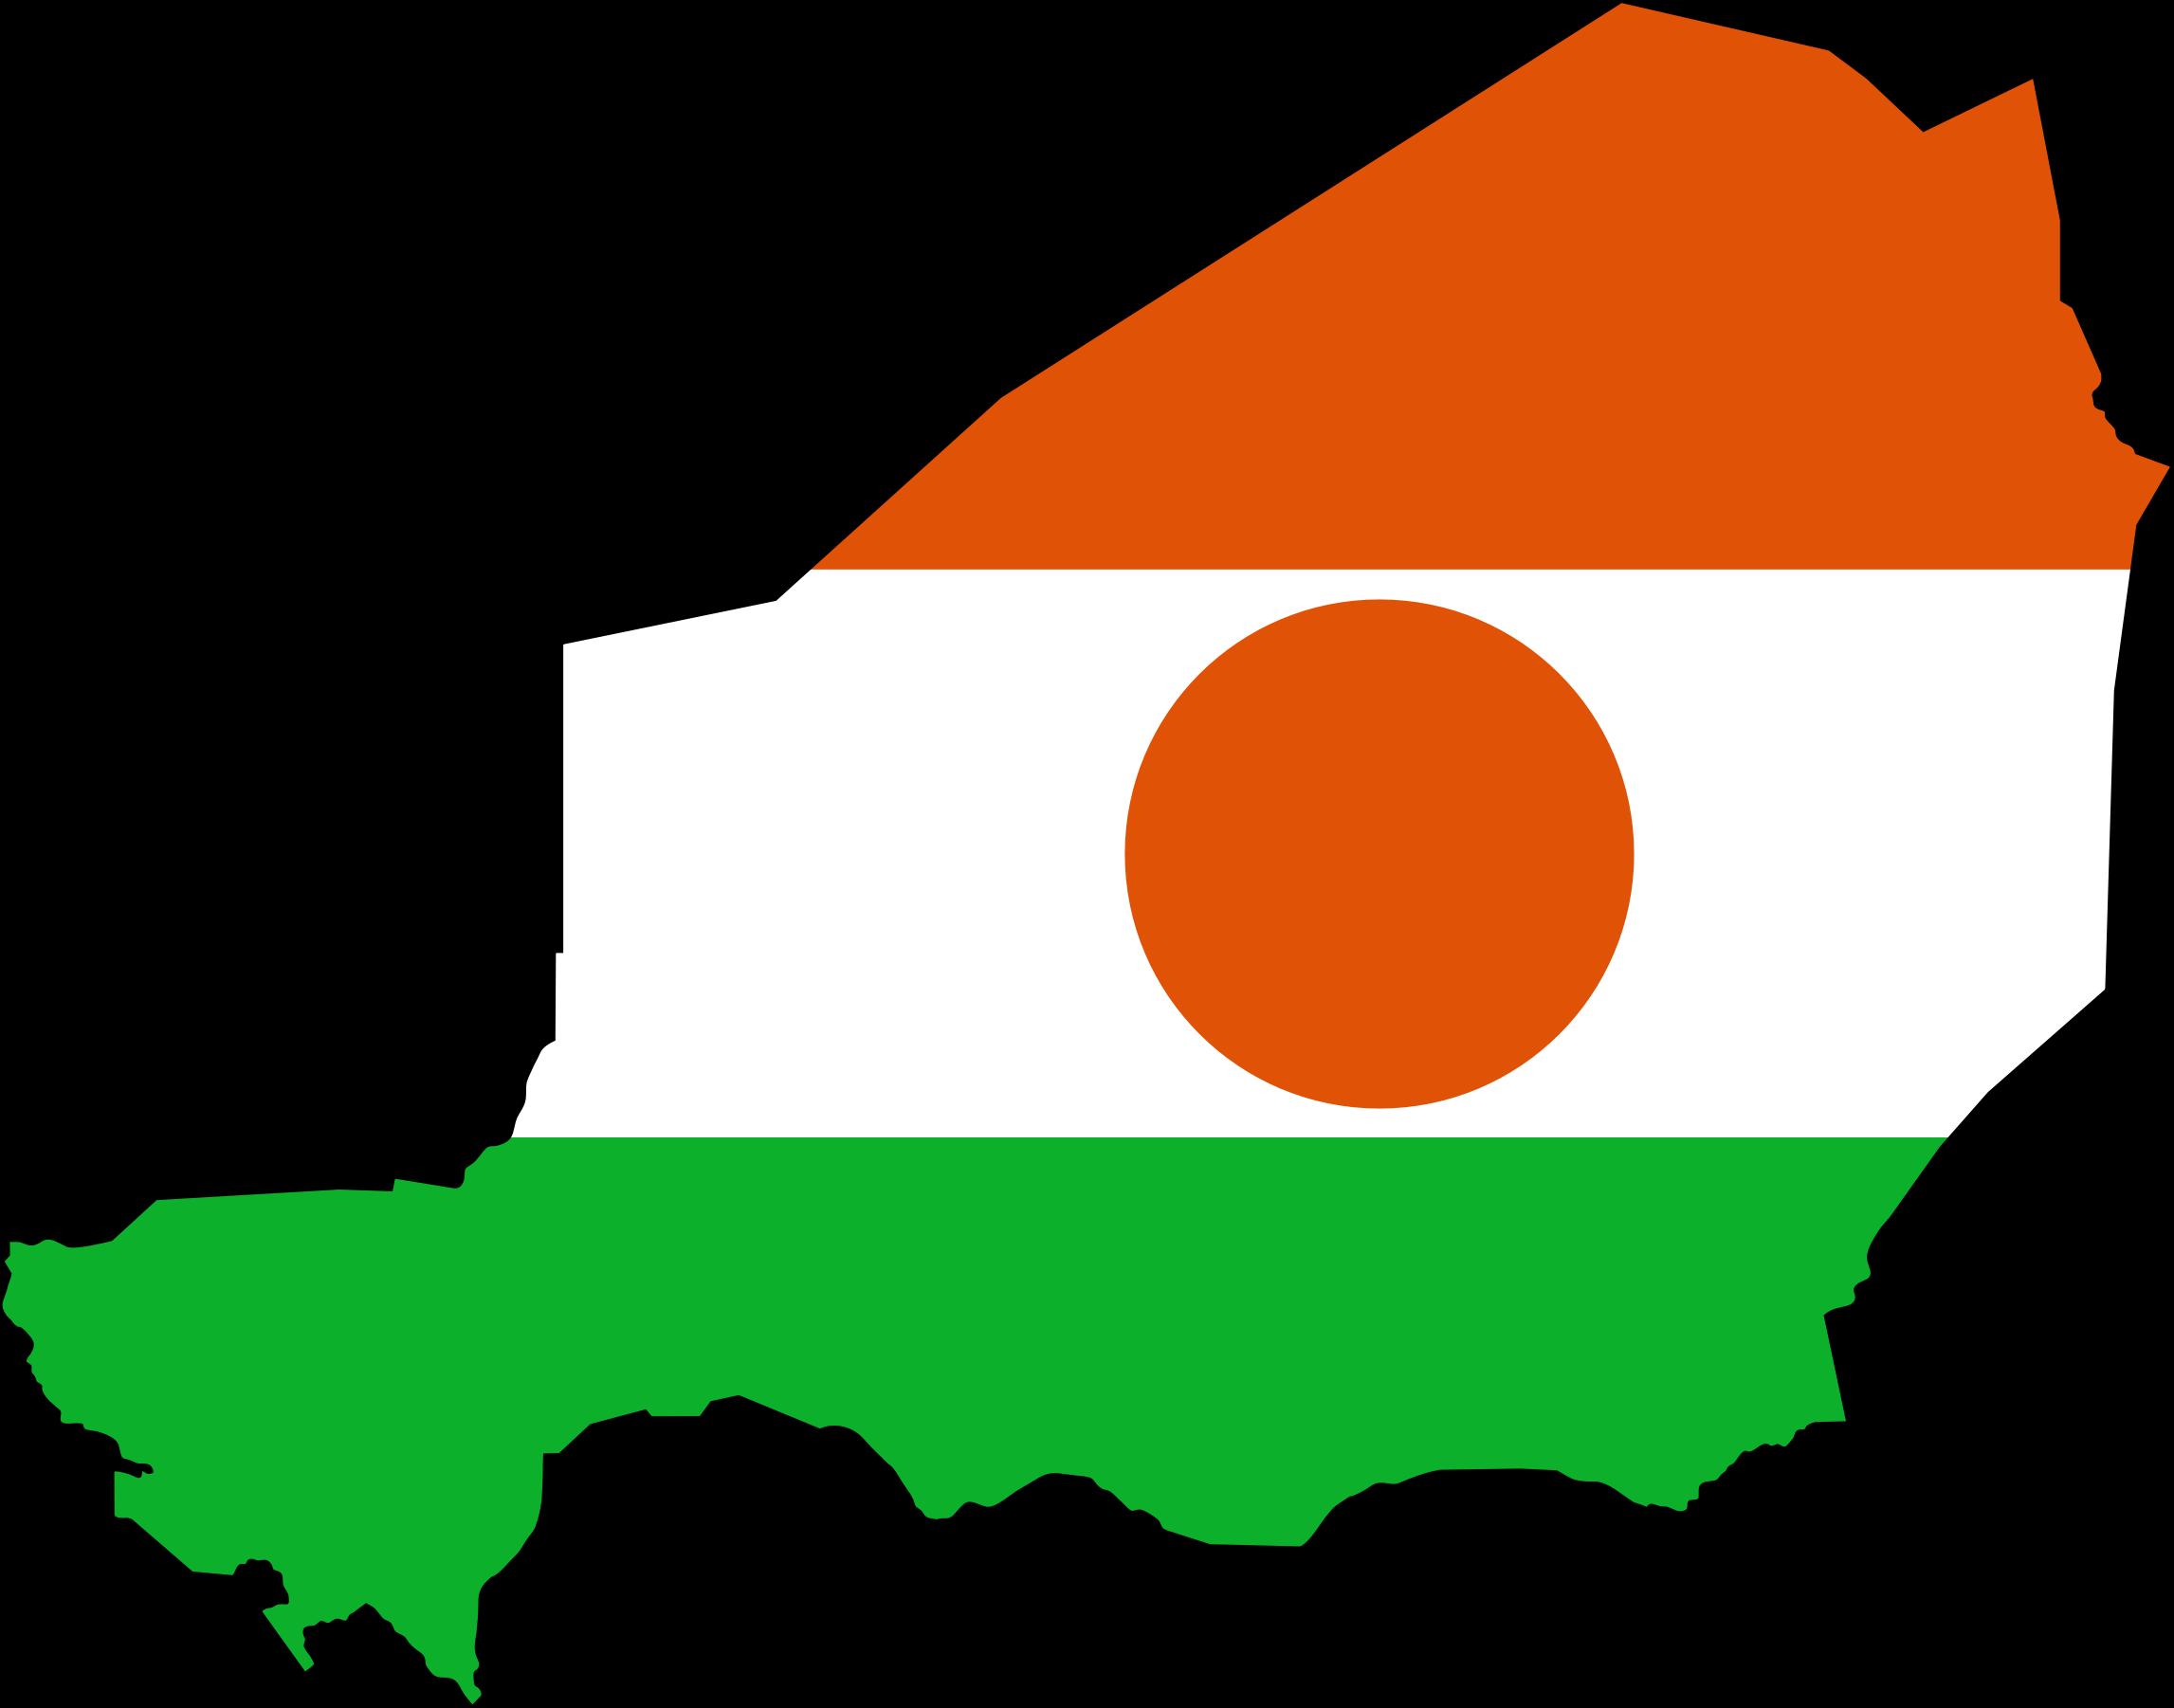 Niger flag clipart.